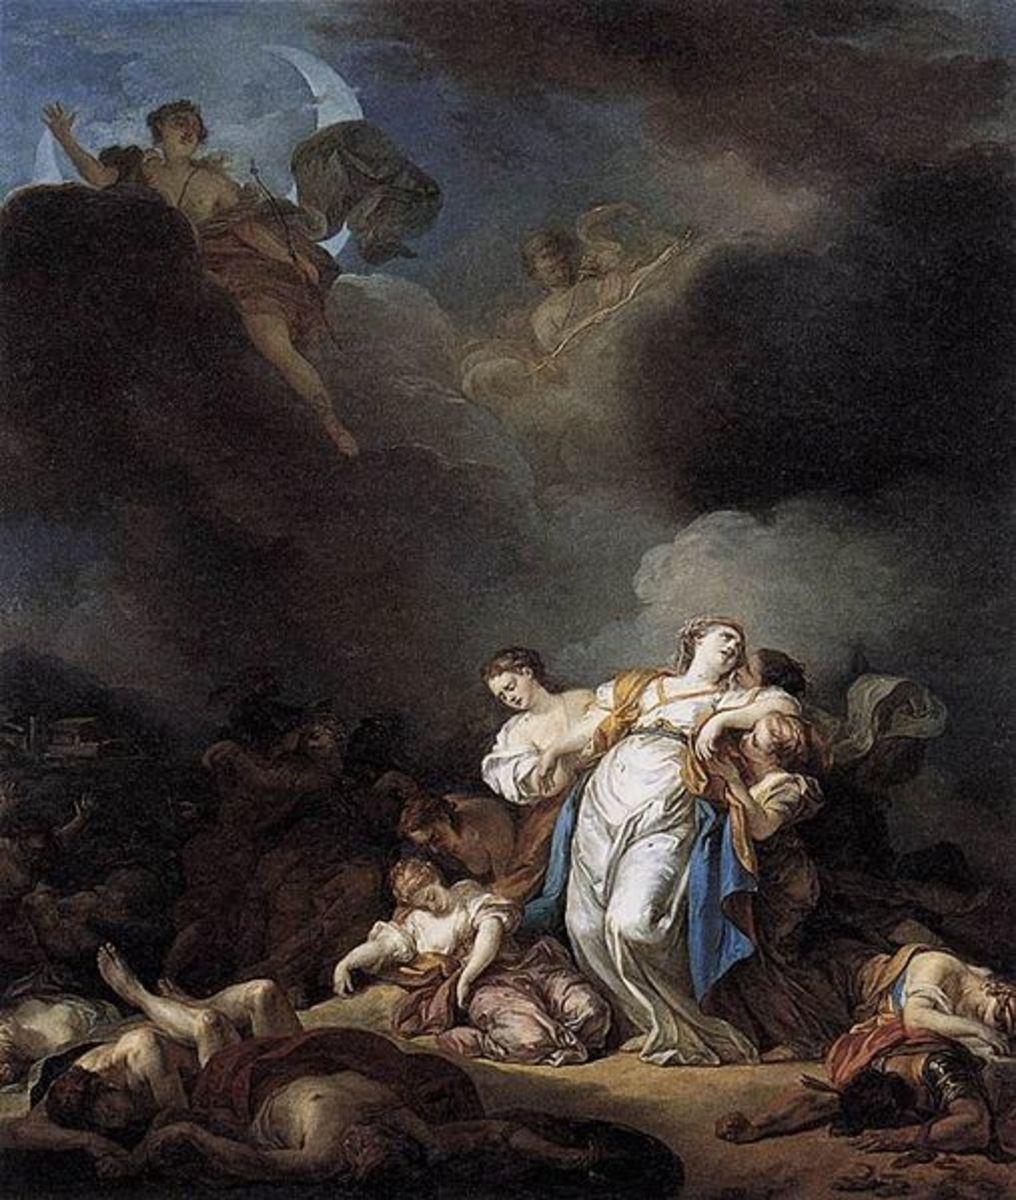 Anicet-Charles-Gabriel Lemonnier (1743–1824) PD-art-100